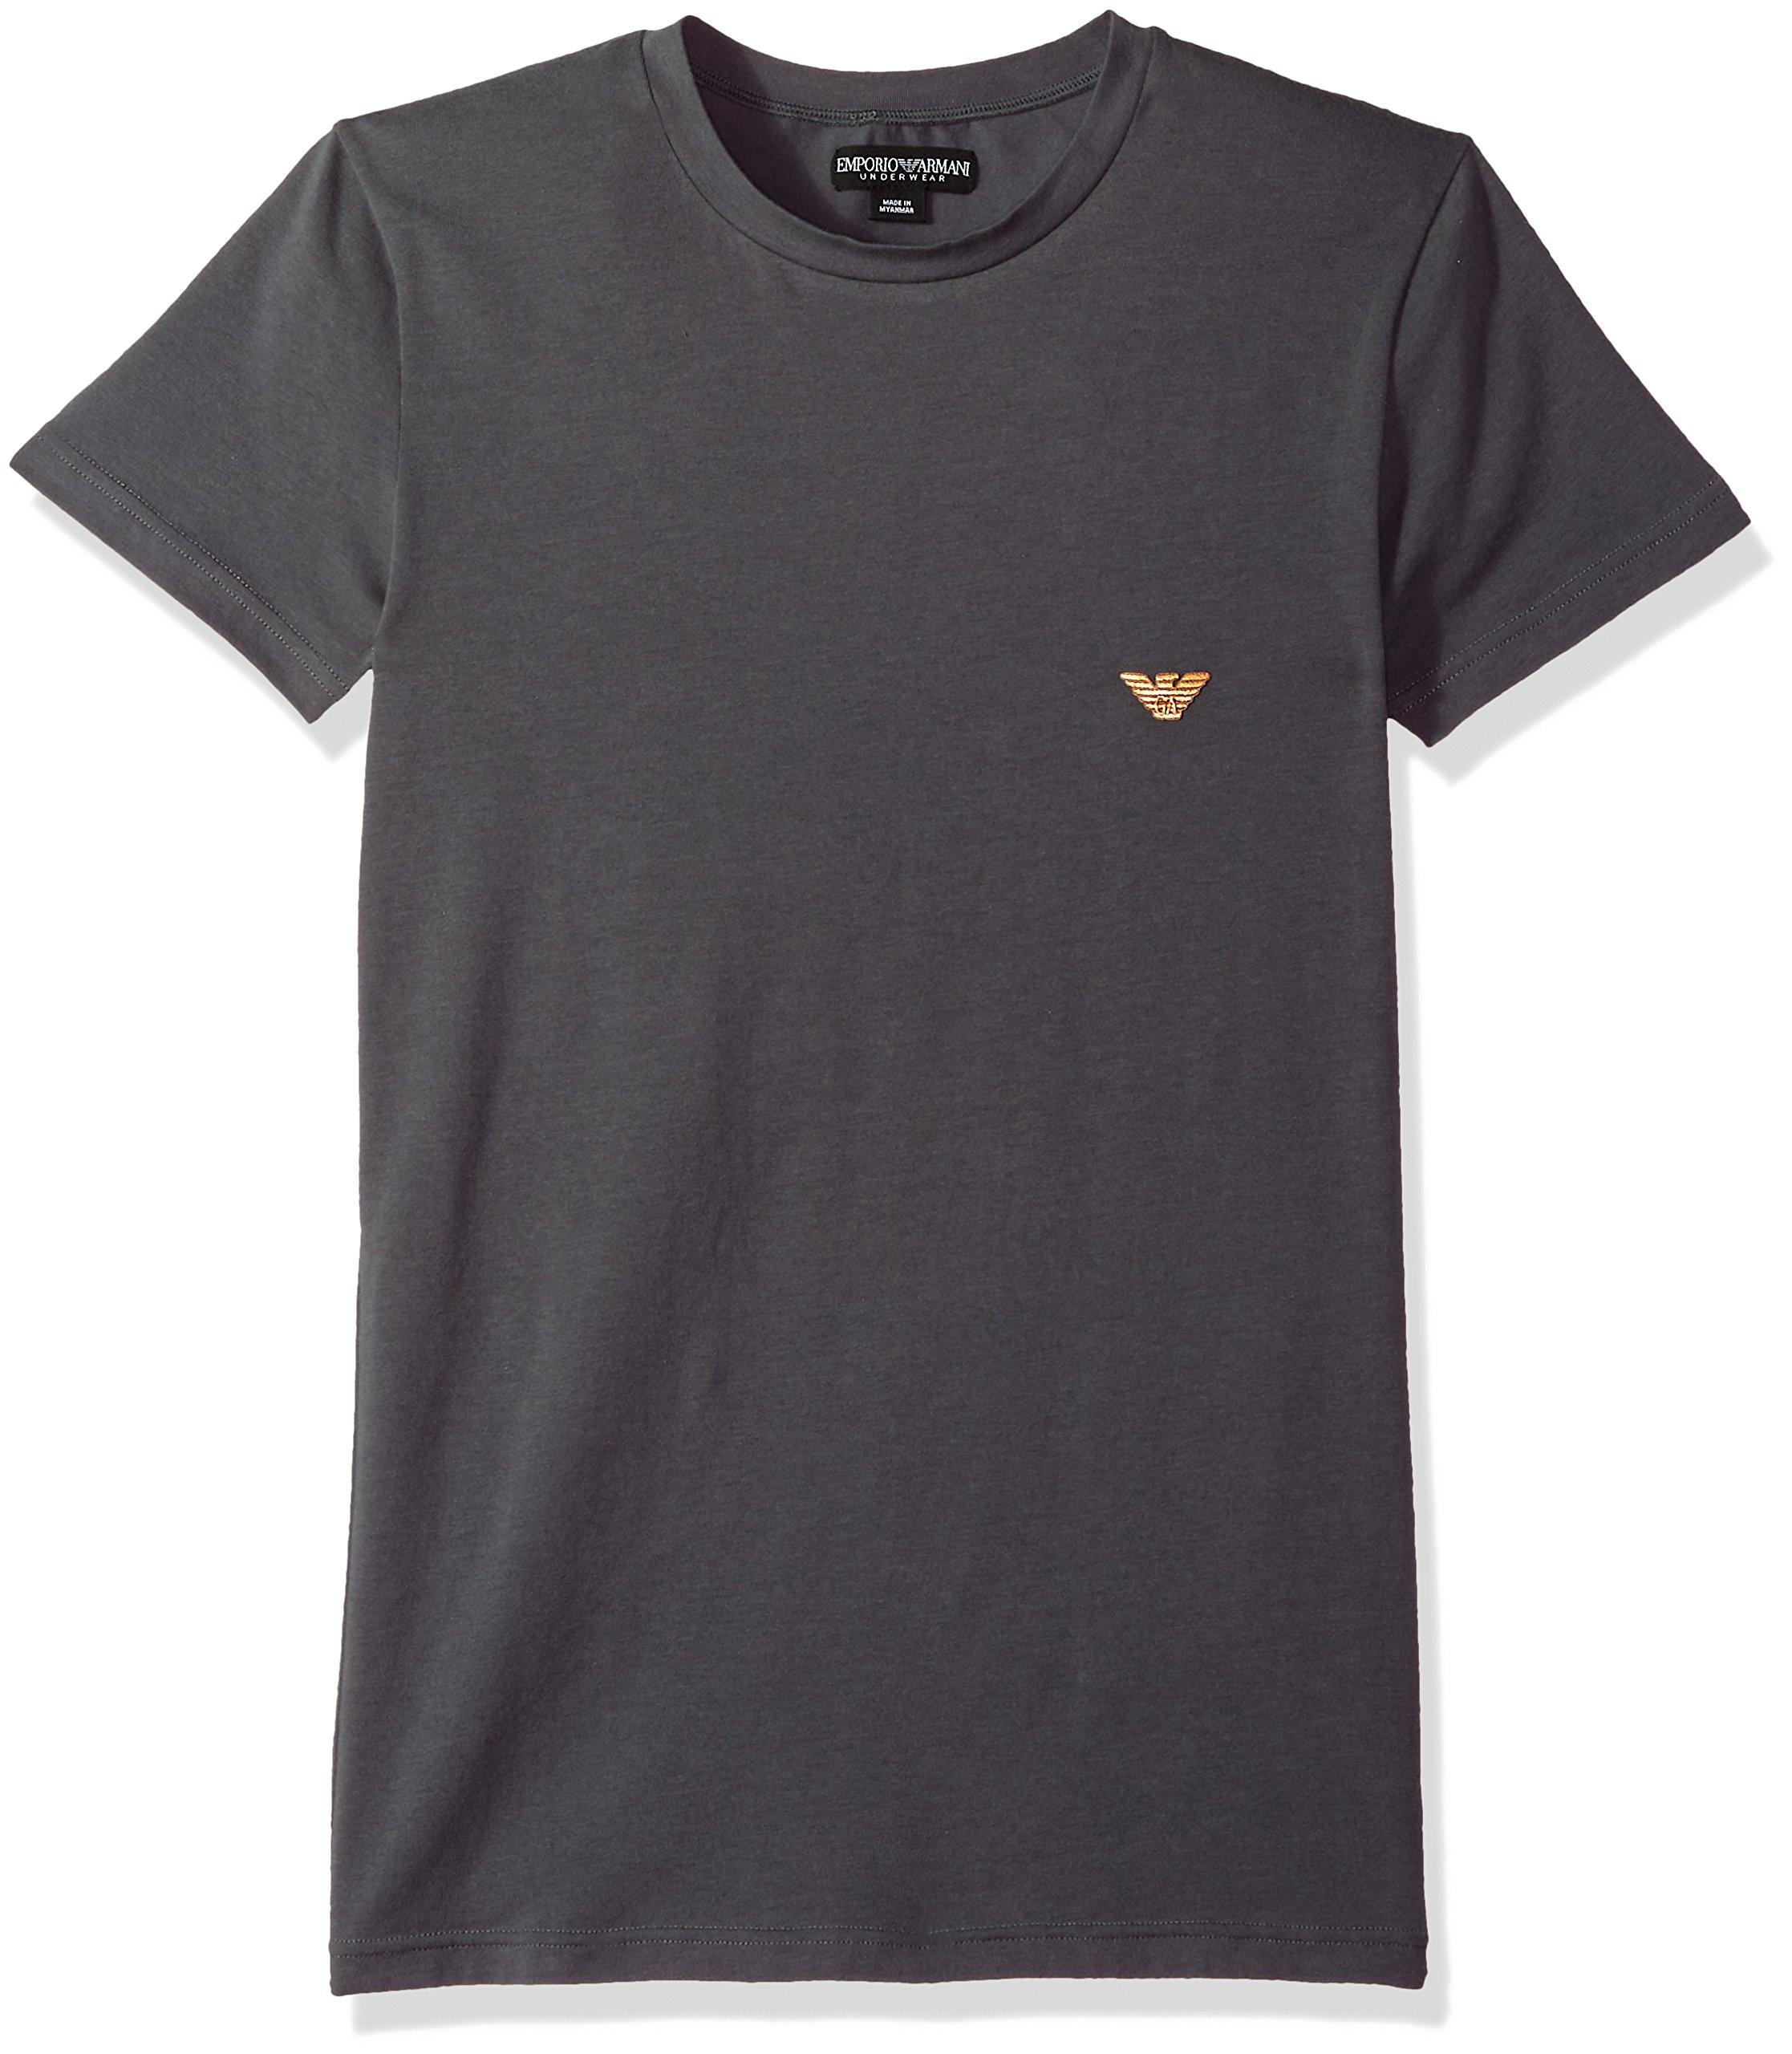 Emporio Armani Men's Metal Logo Band Crew Neck T-Shirt, Dark Grey, M